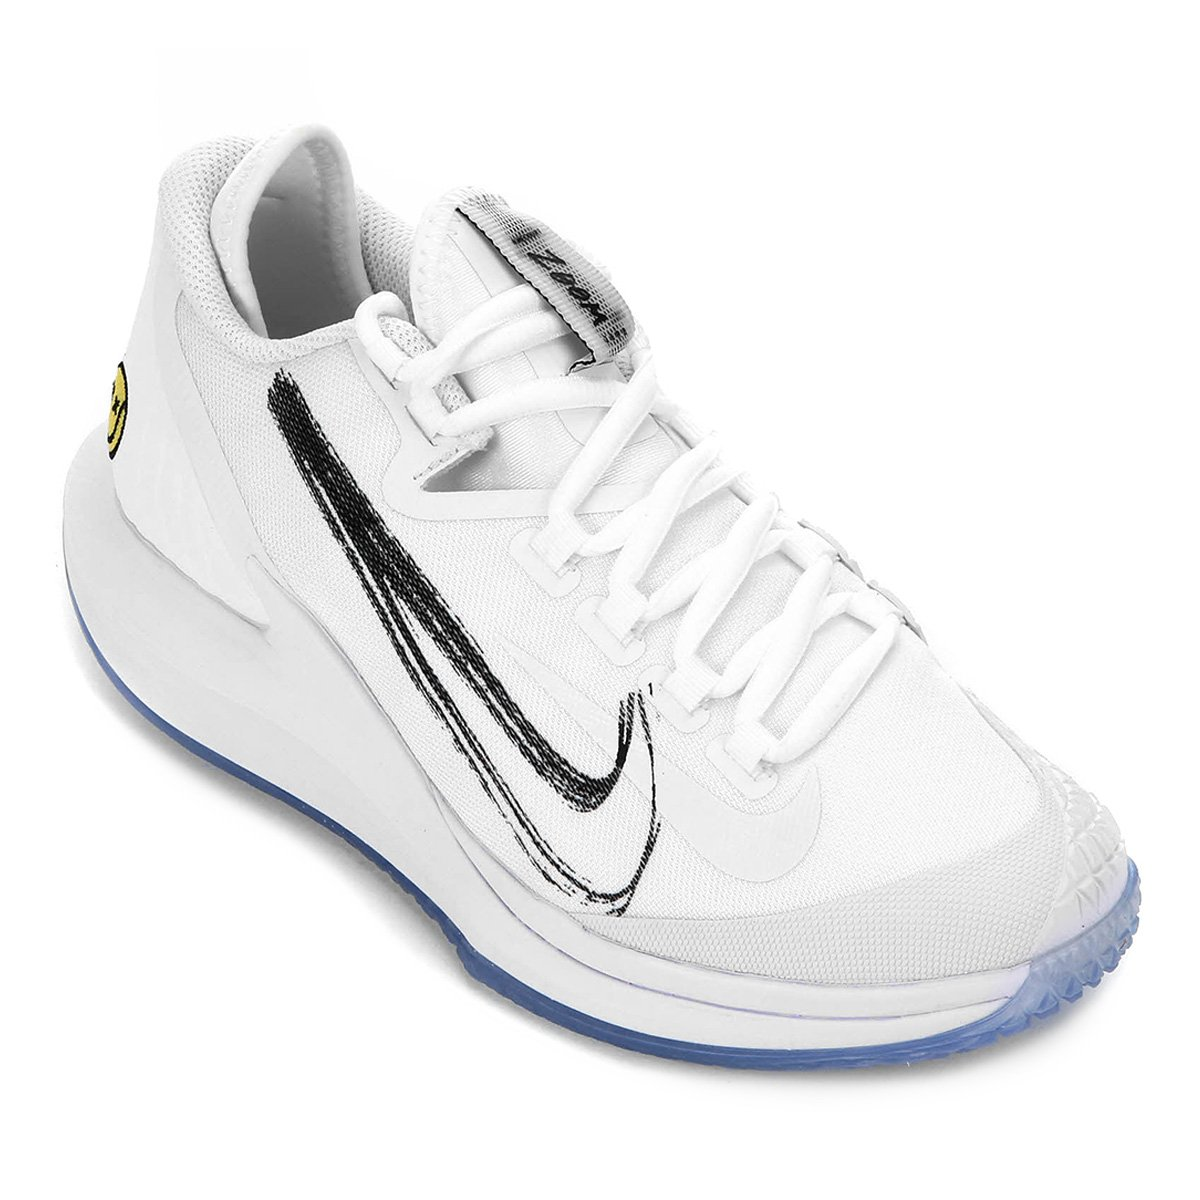 Tênis Nike Air Max Wildcard HC Masculino Branco e Preto